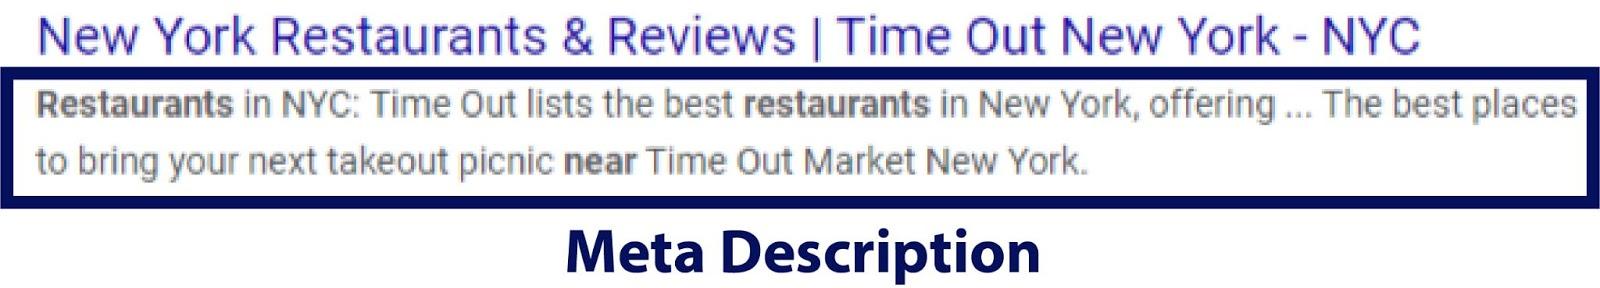 Small business SEO services meta description example